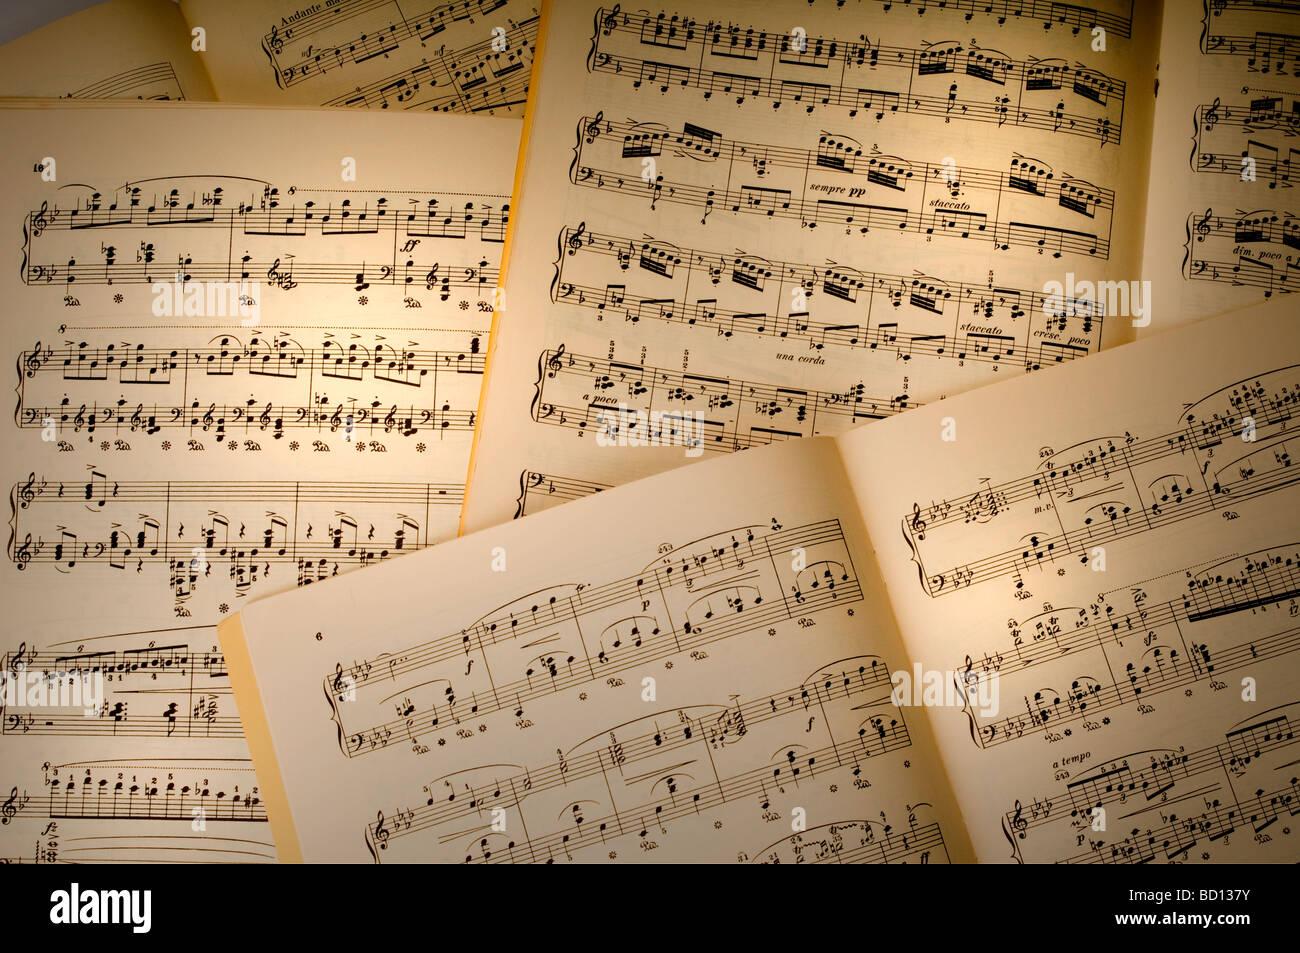 variety of sheet music - Stock Image